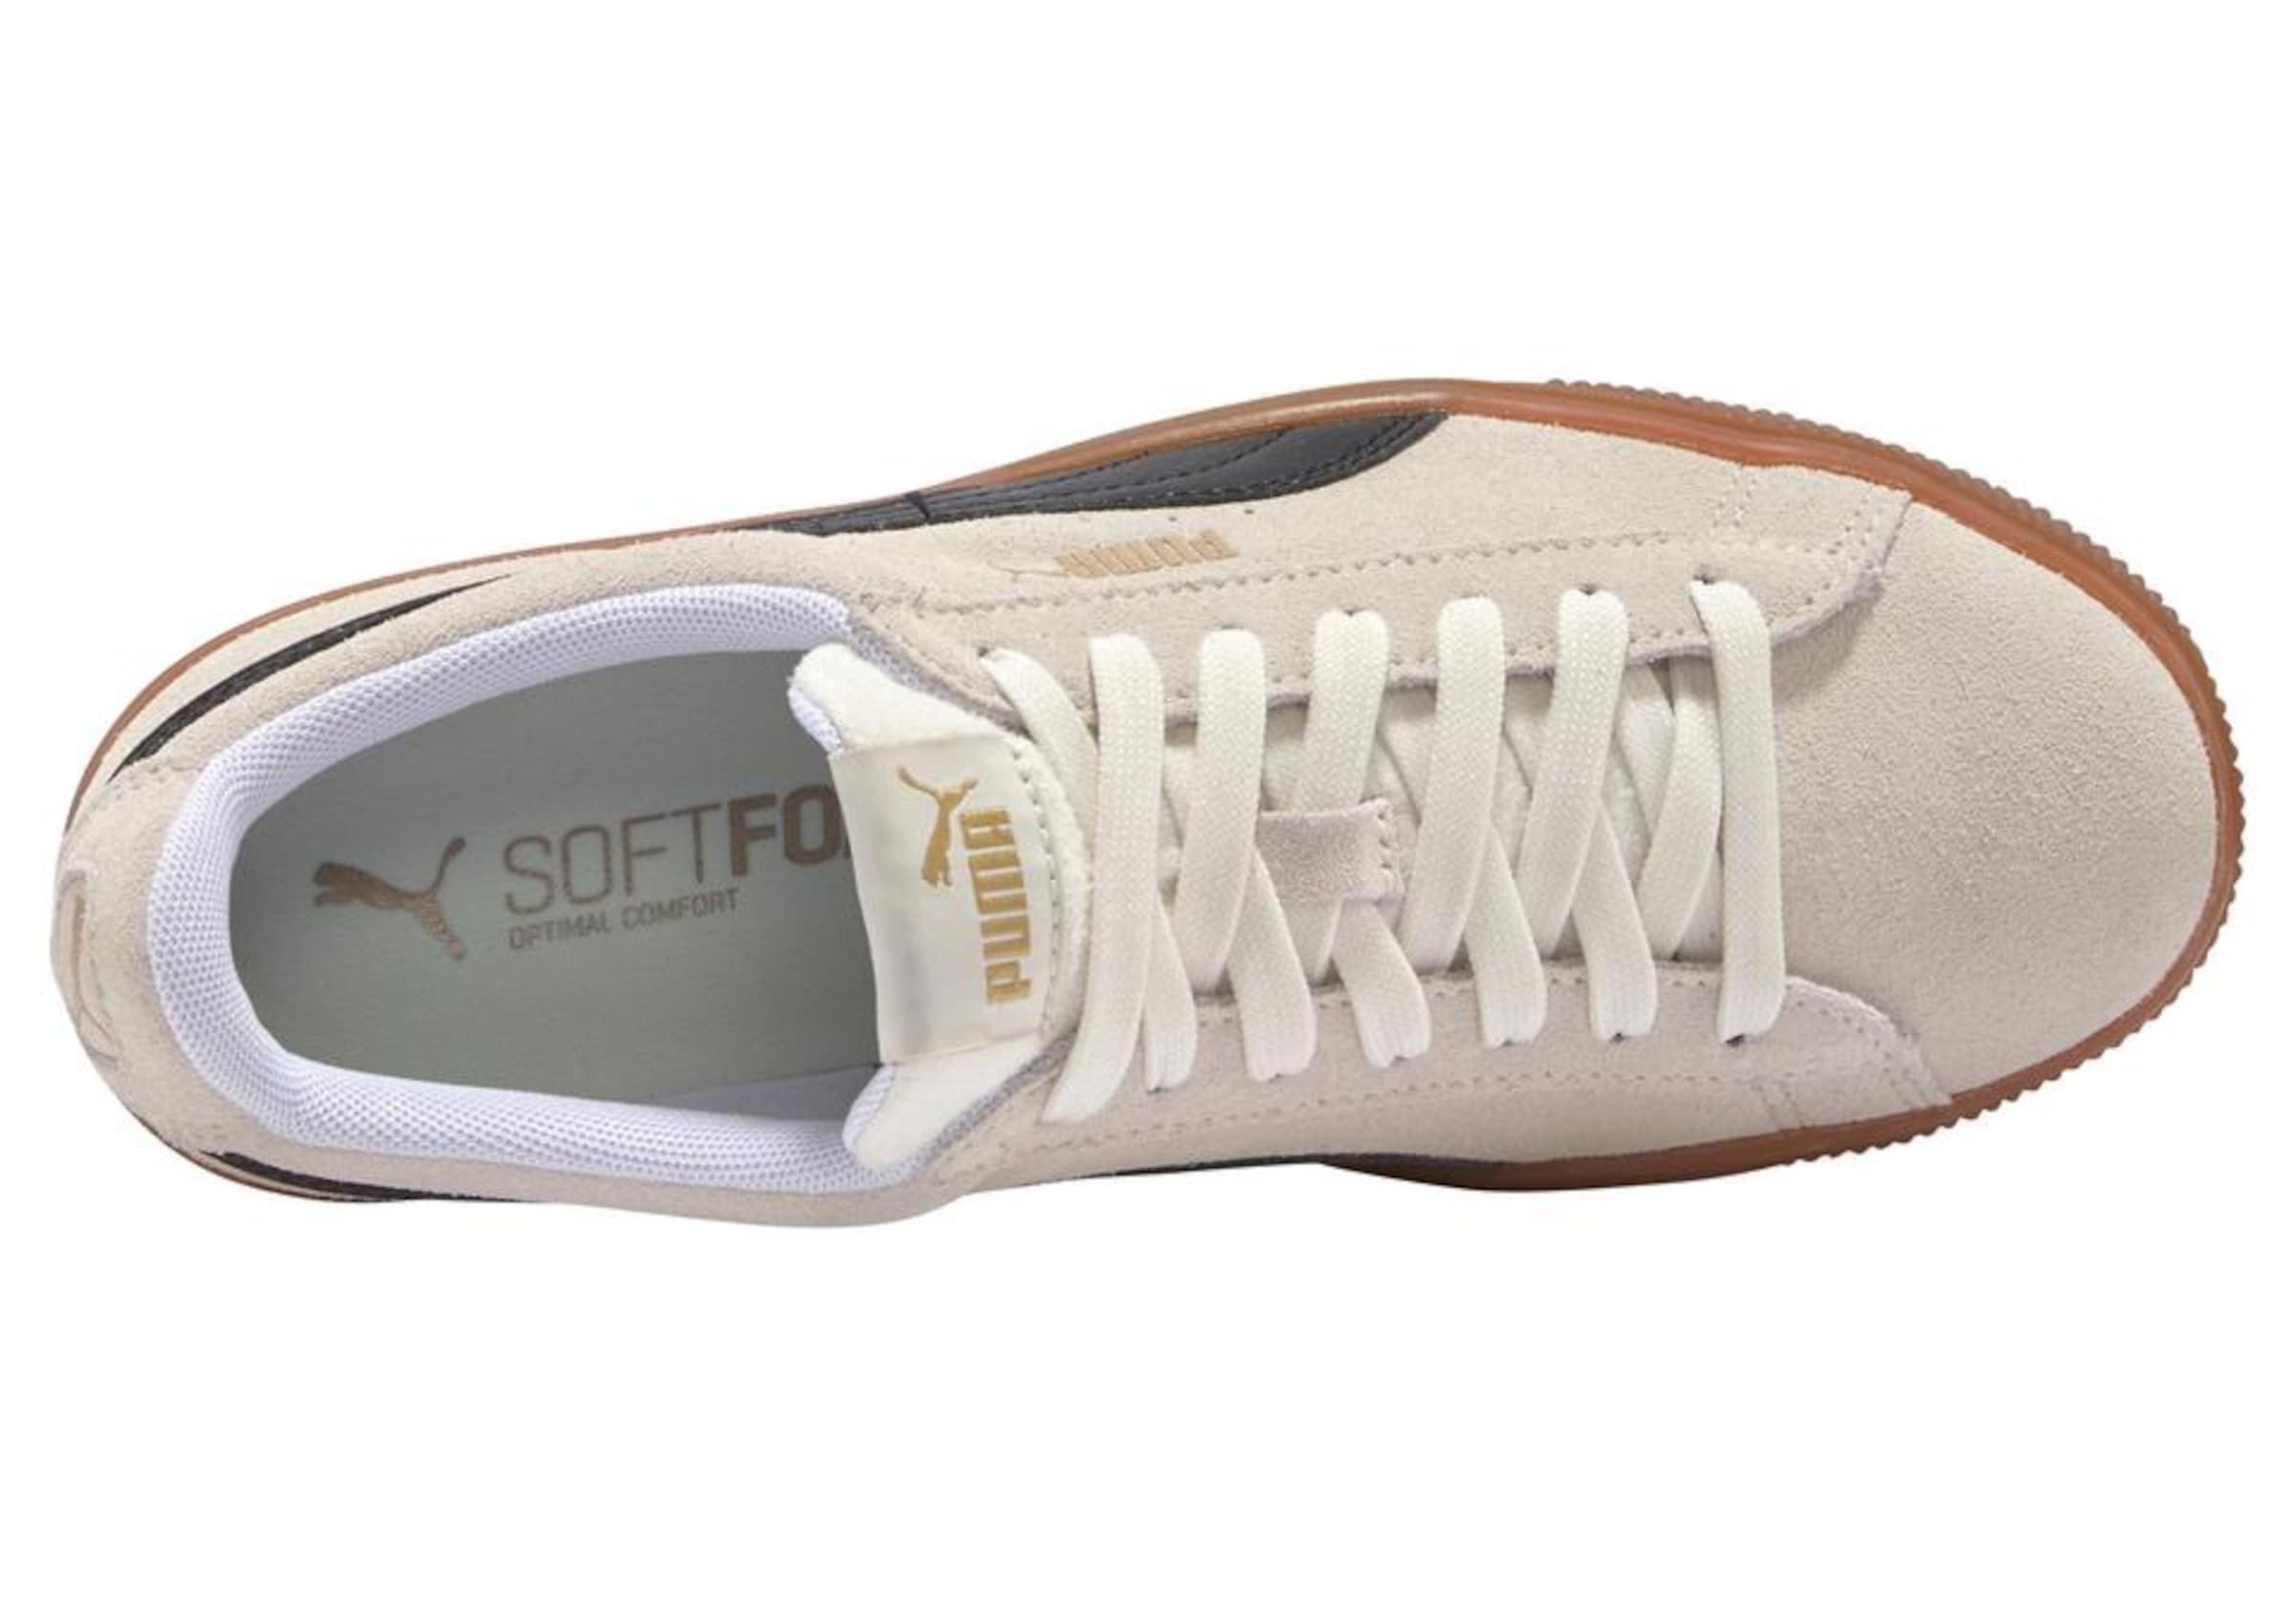 Sneaker NudeHellbraun Schwarz In Stacked Sd' 'vikky Puma vf7Ib6gyY